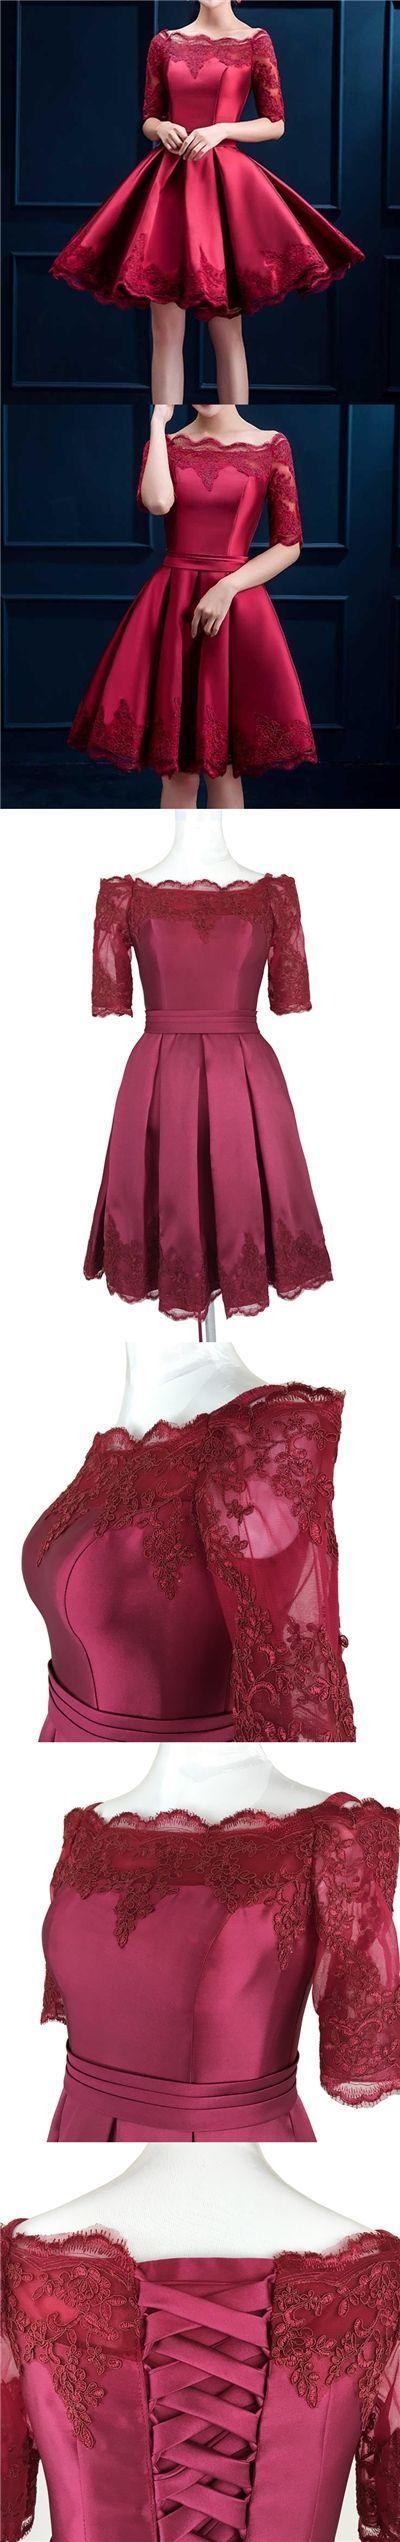 Homecoming Dress Off-the-shoulder Burgundy Short Prom Dress Party Dress